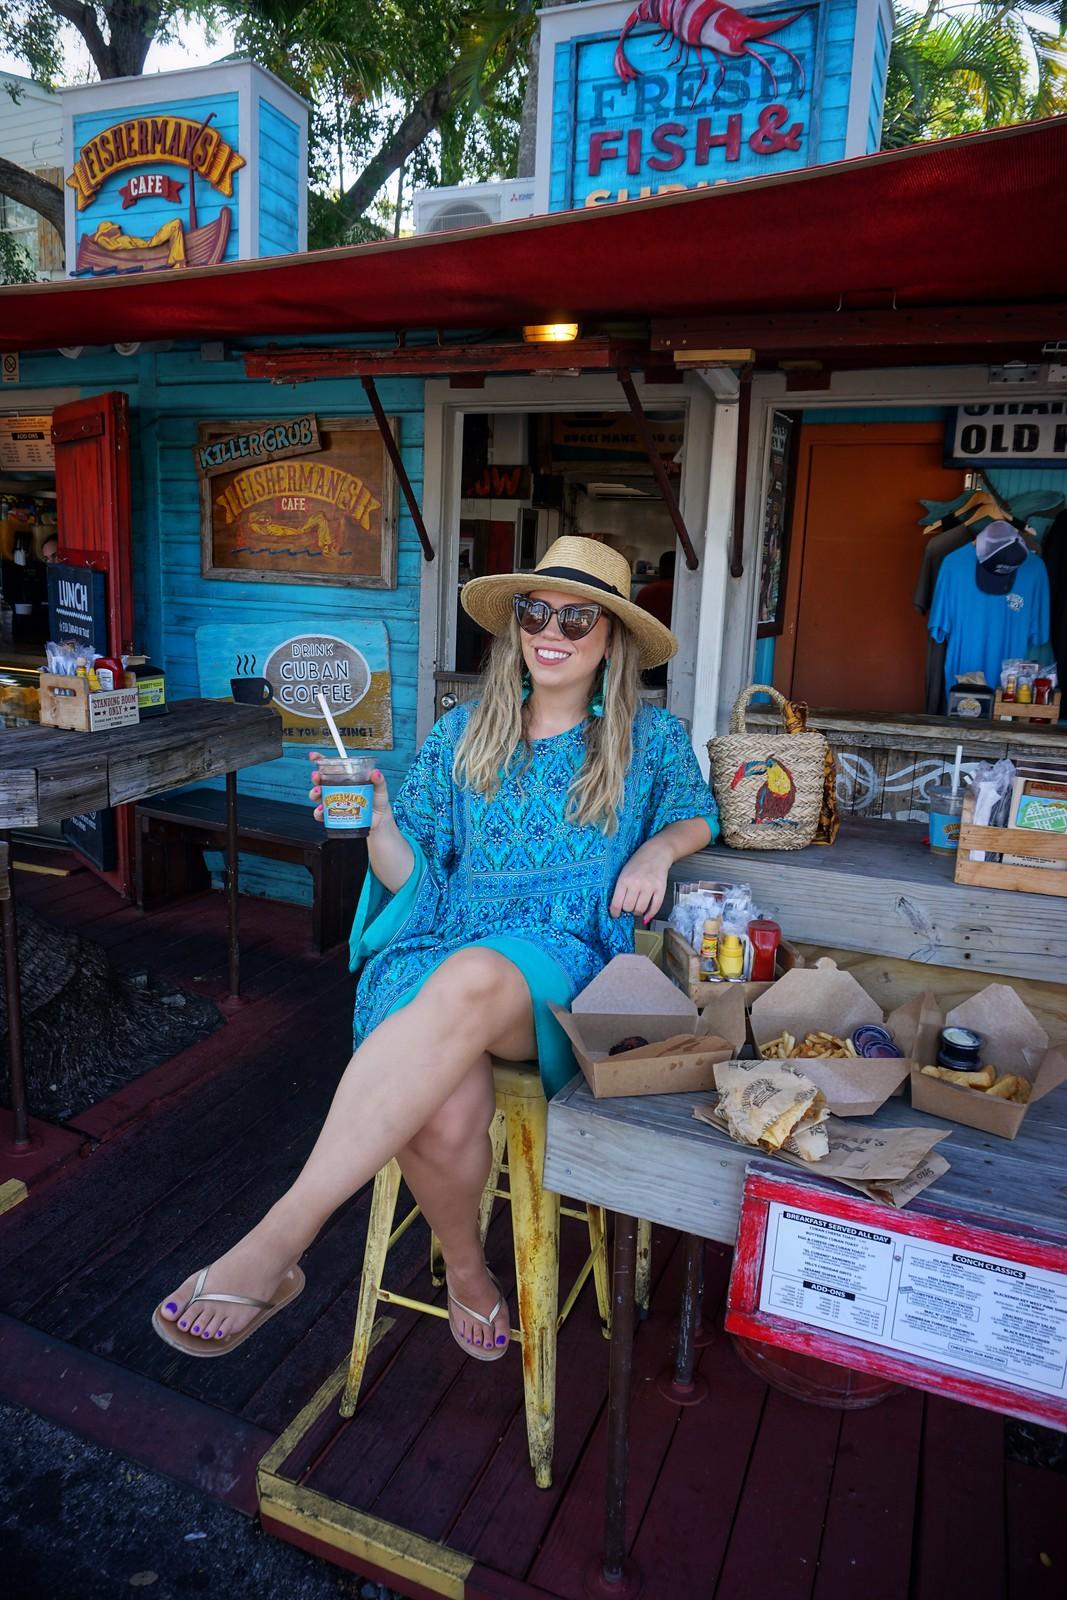 fishermans-cafe-ultimate-road-trip-5-days-florida-keys-itinerary-what-to-do-key-west-key-largo-islamorada-marathon-miami-vacation-guide